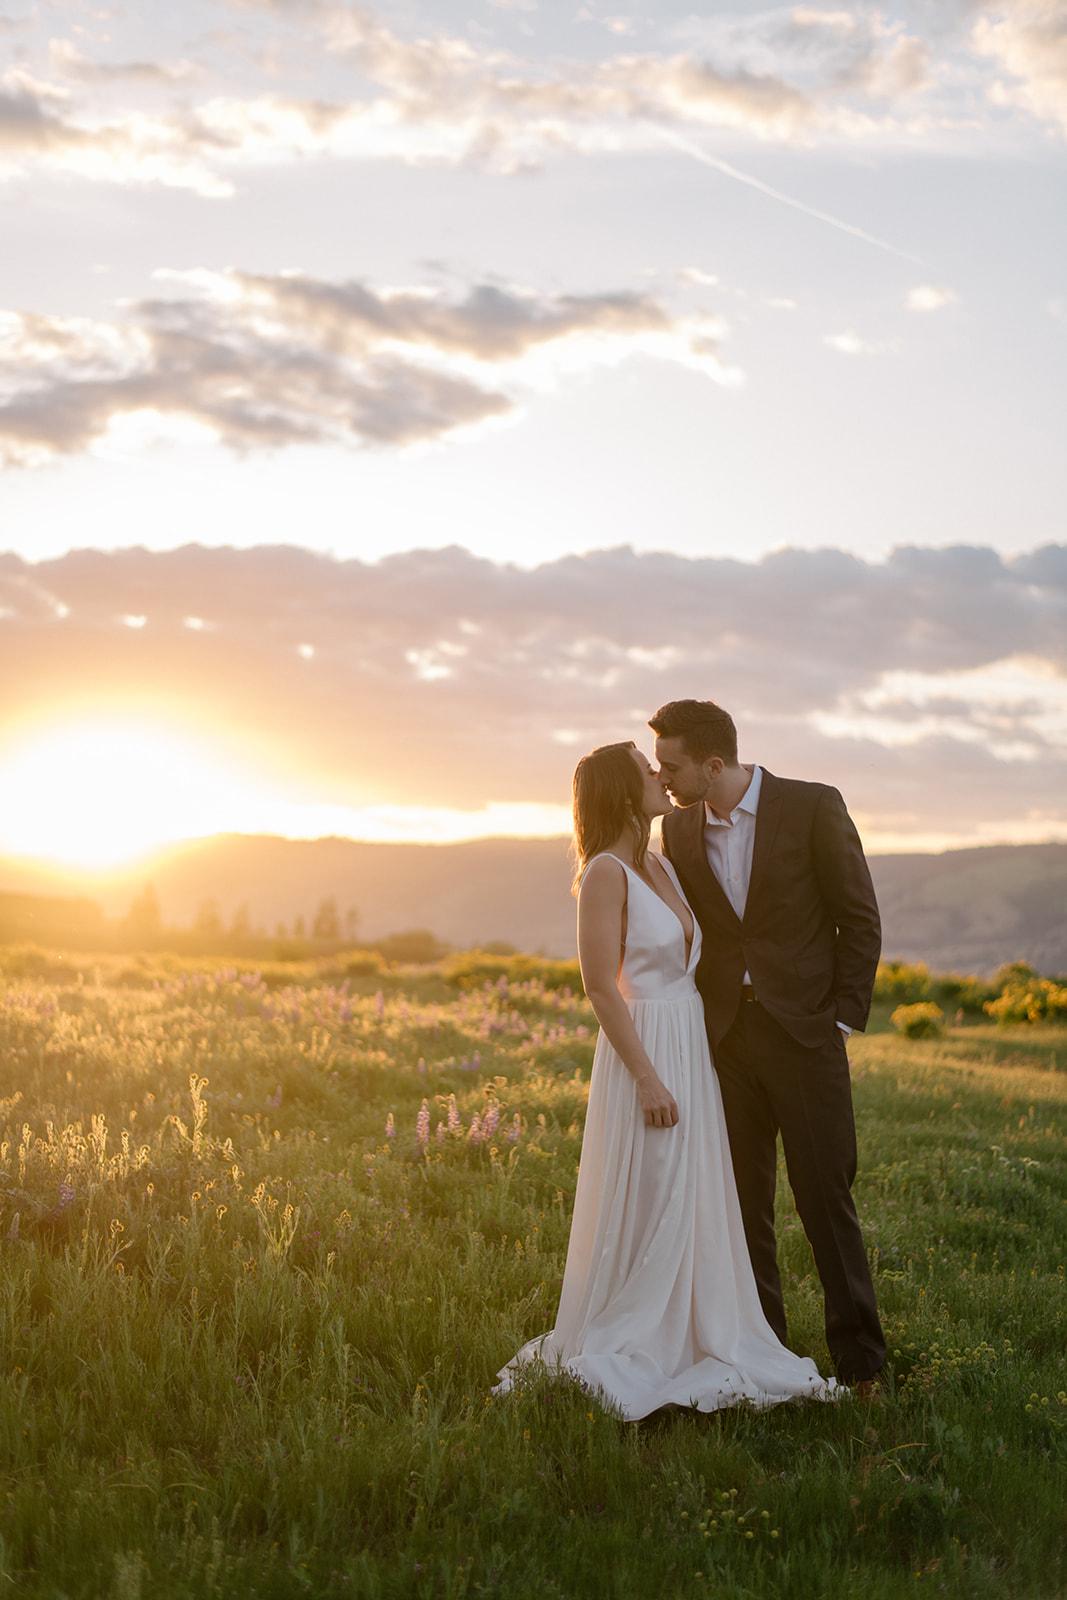 kamea_events_wedding_planner_portland_DeusAmor103.jpg